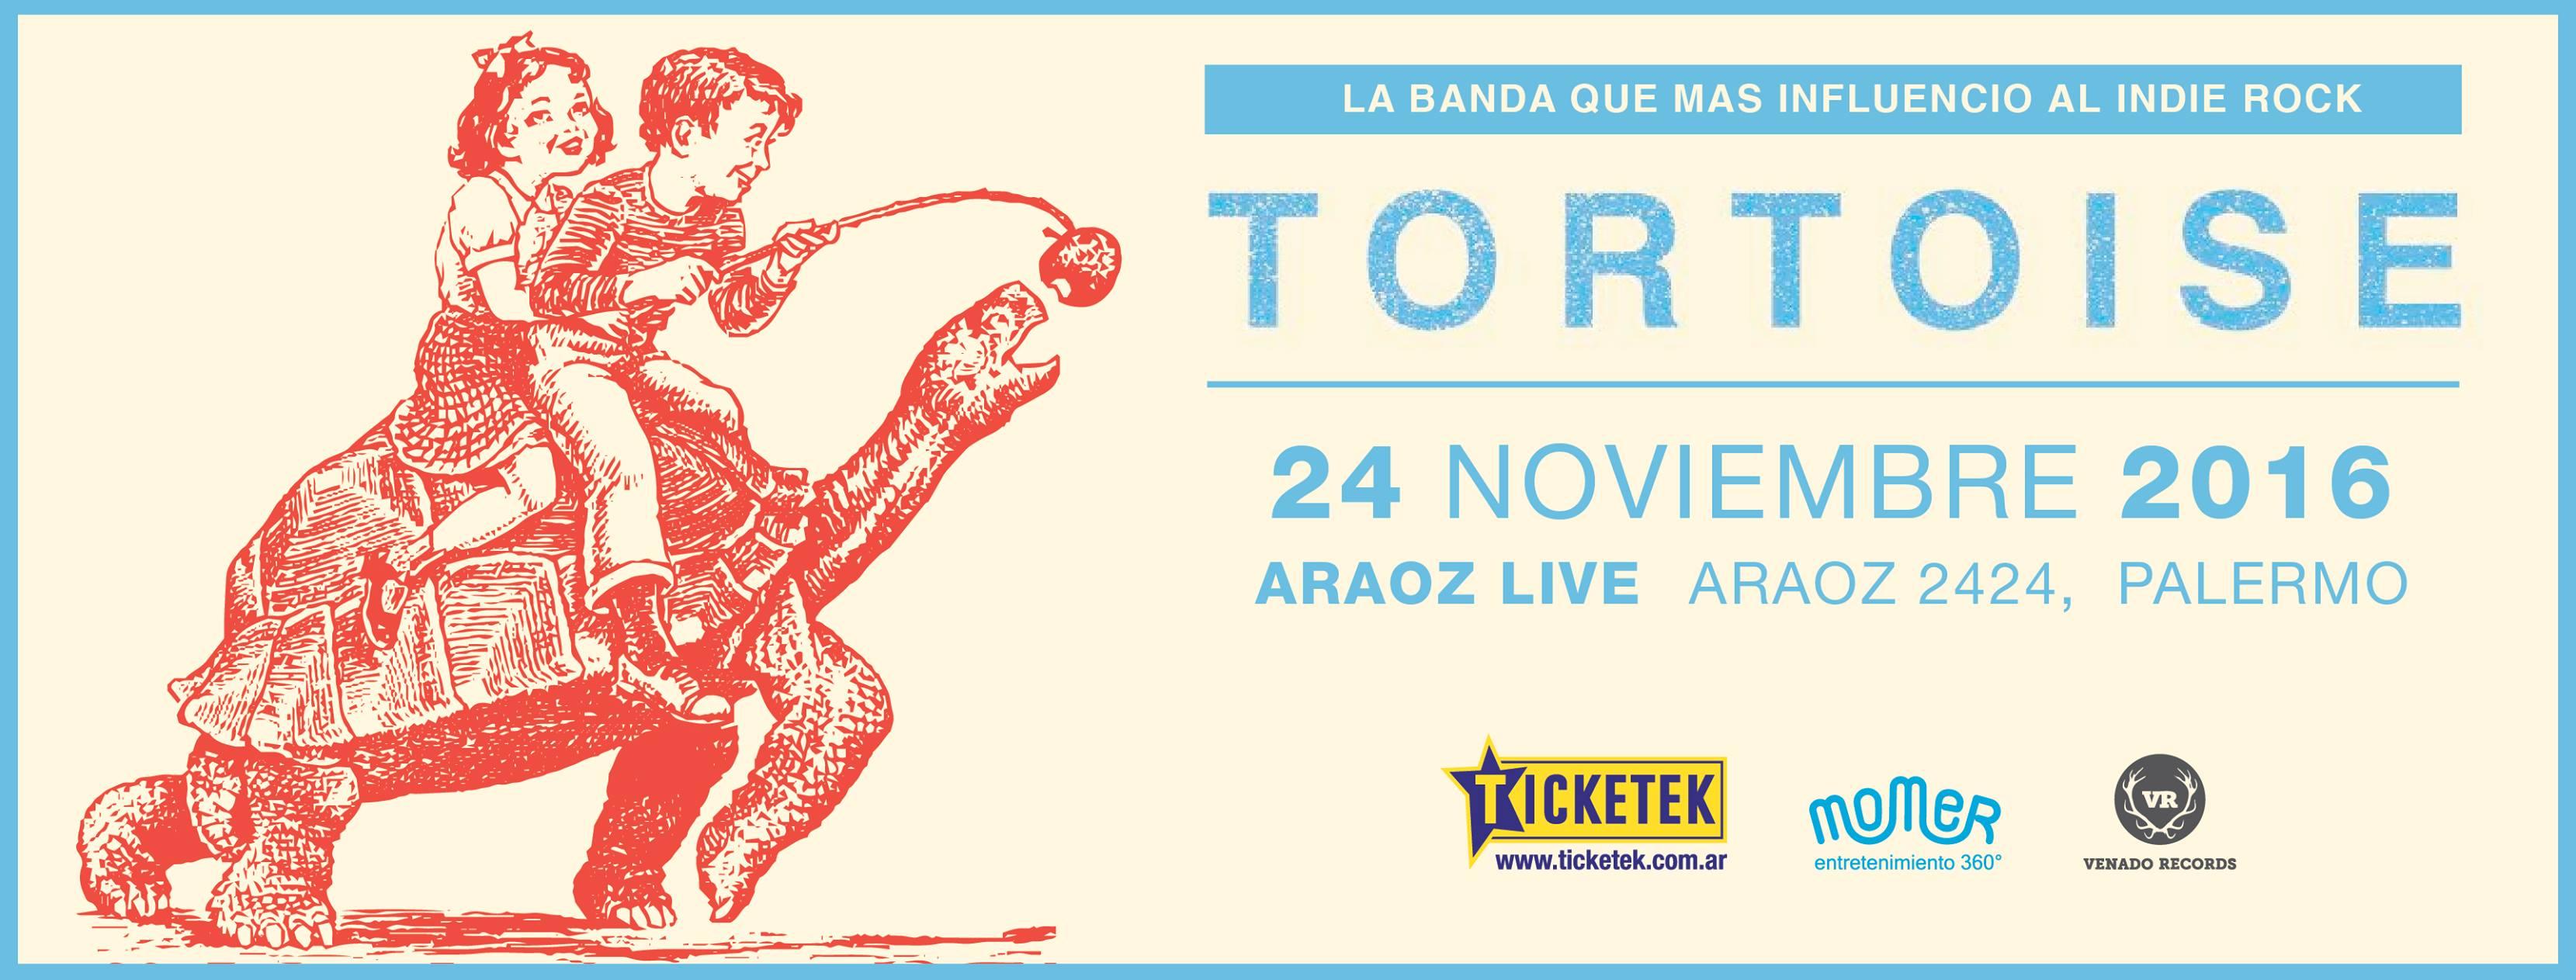 tortoise-argentina